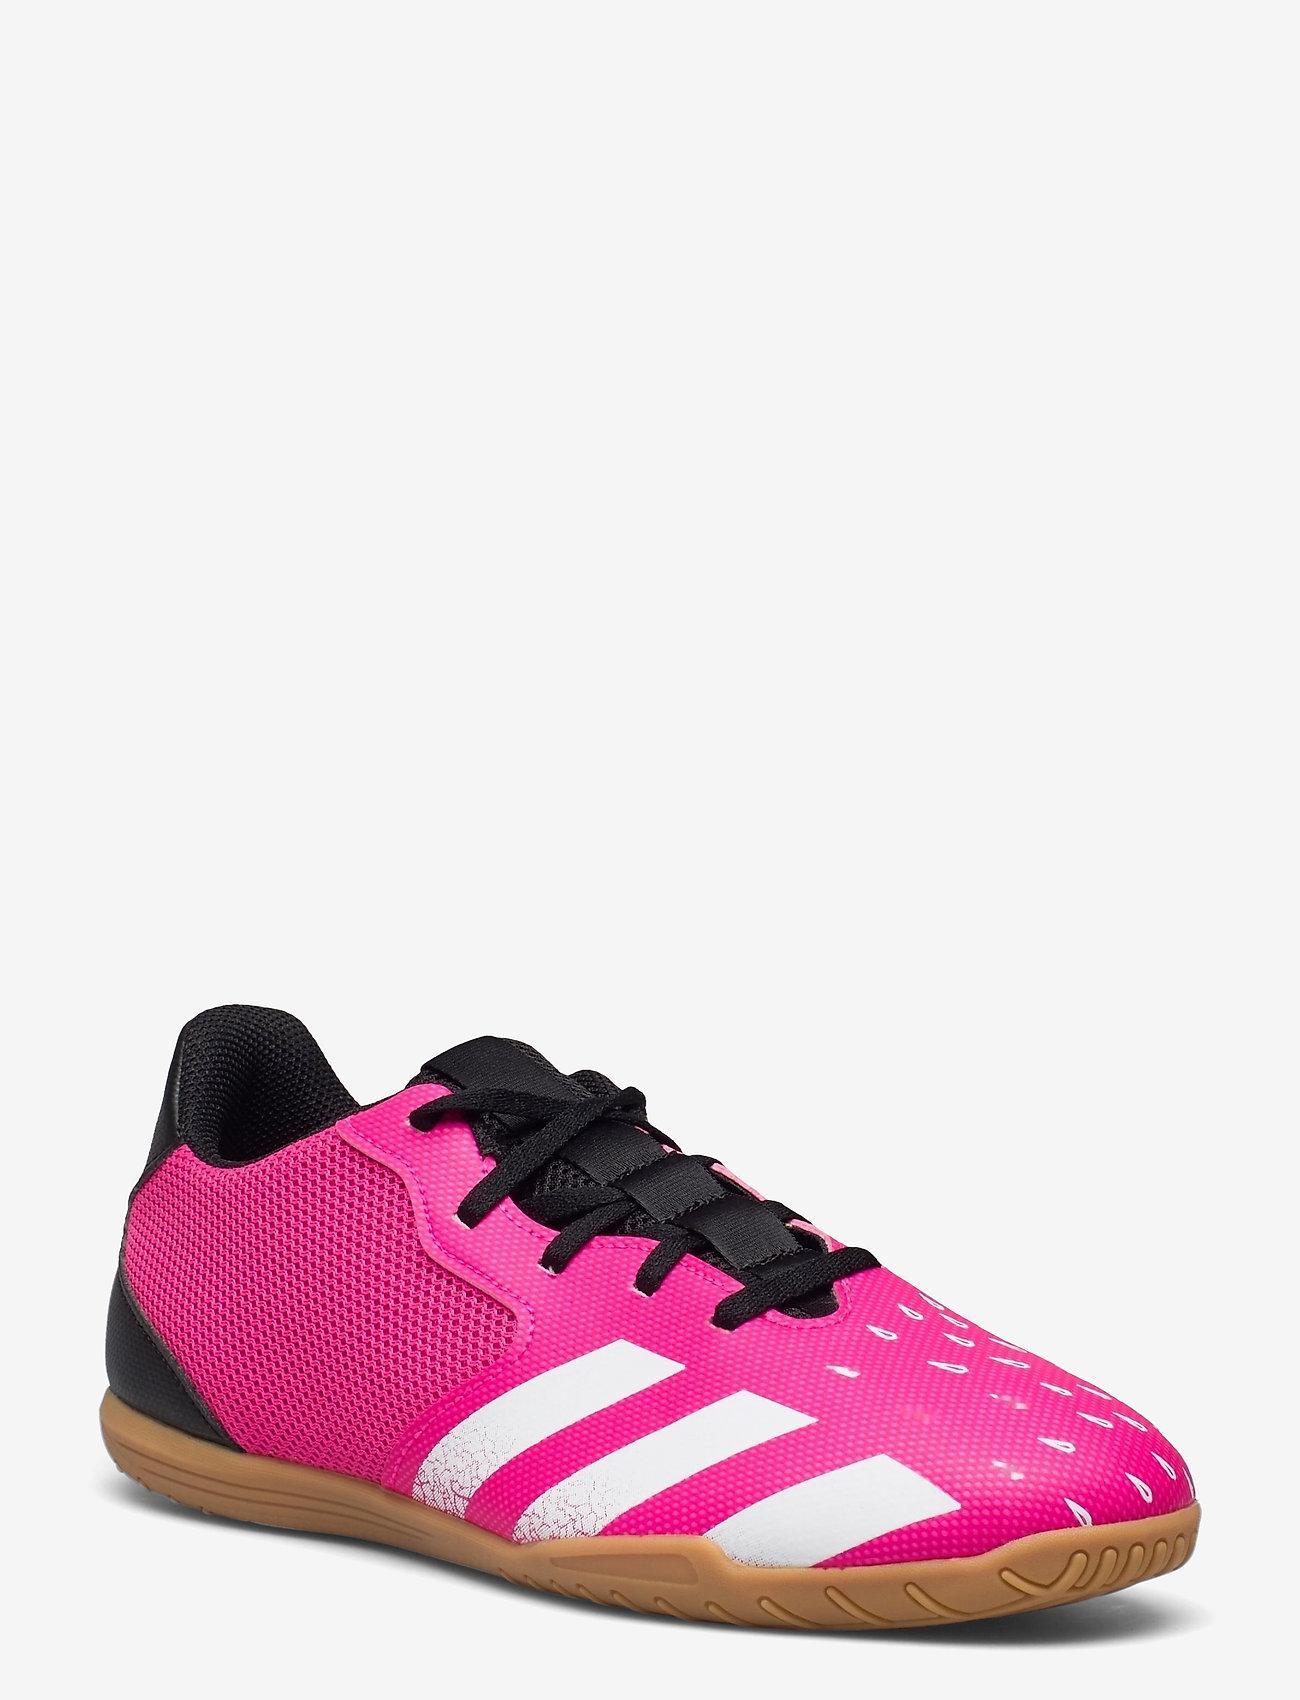 adidas Performance - Predator Freak.4 Sala Indoor Boots - fodboldsko - shopnk/ftwwht/cblack - 1